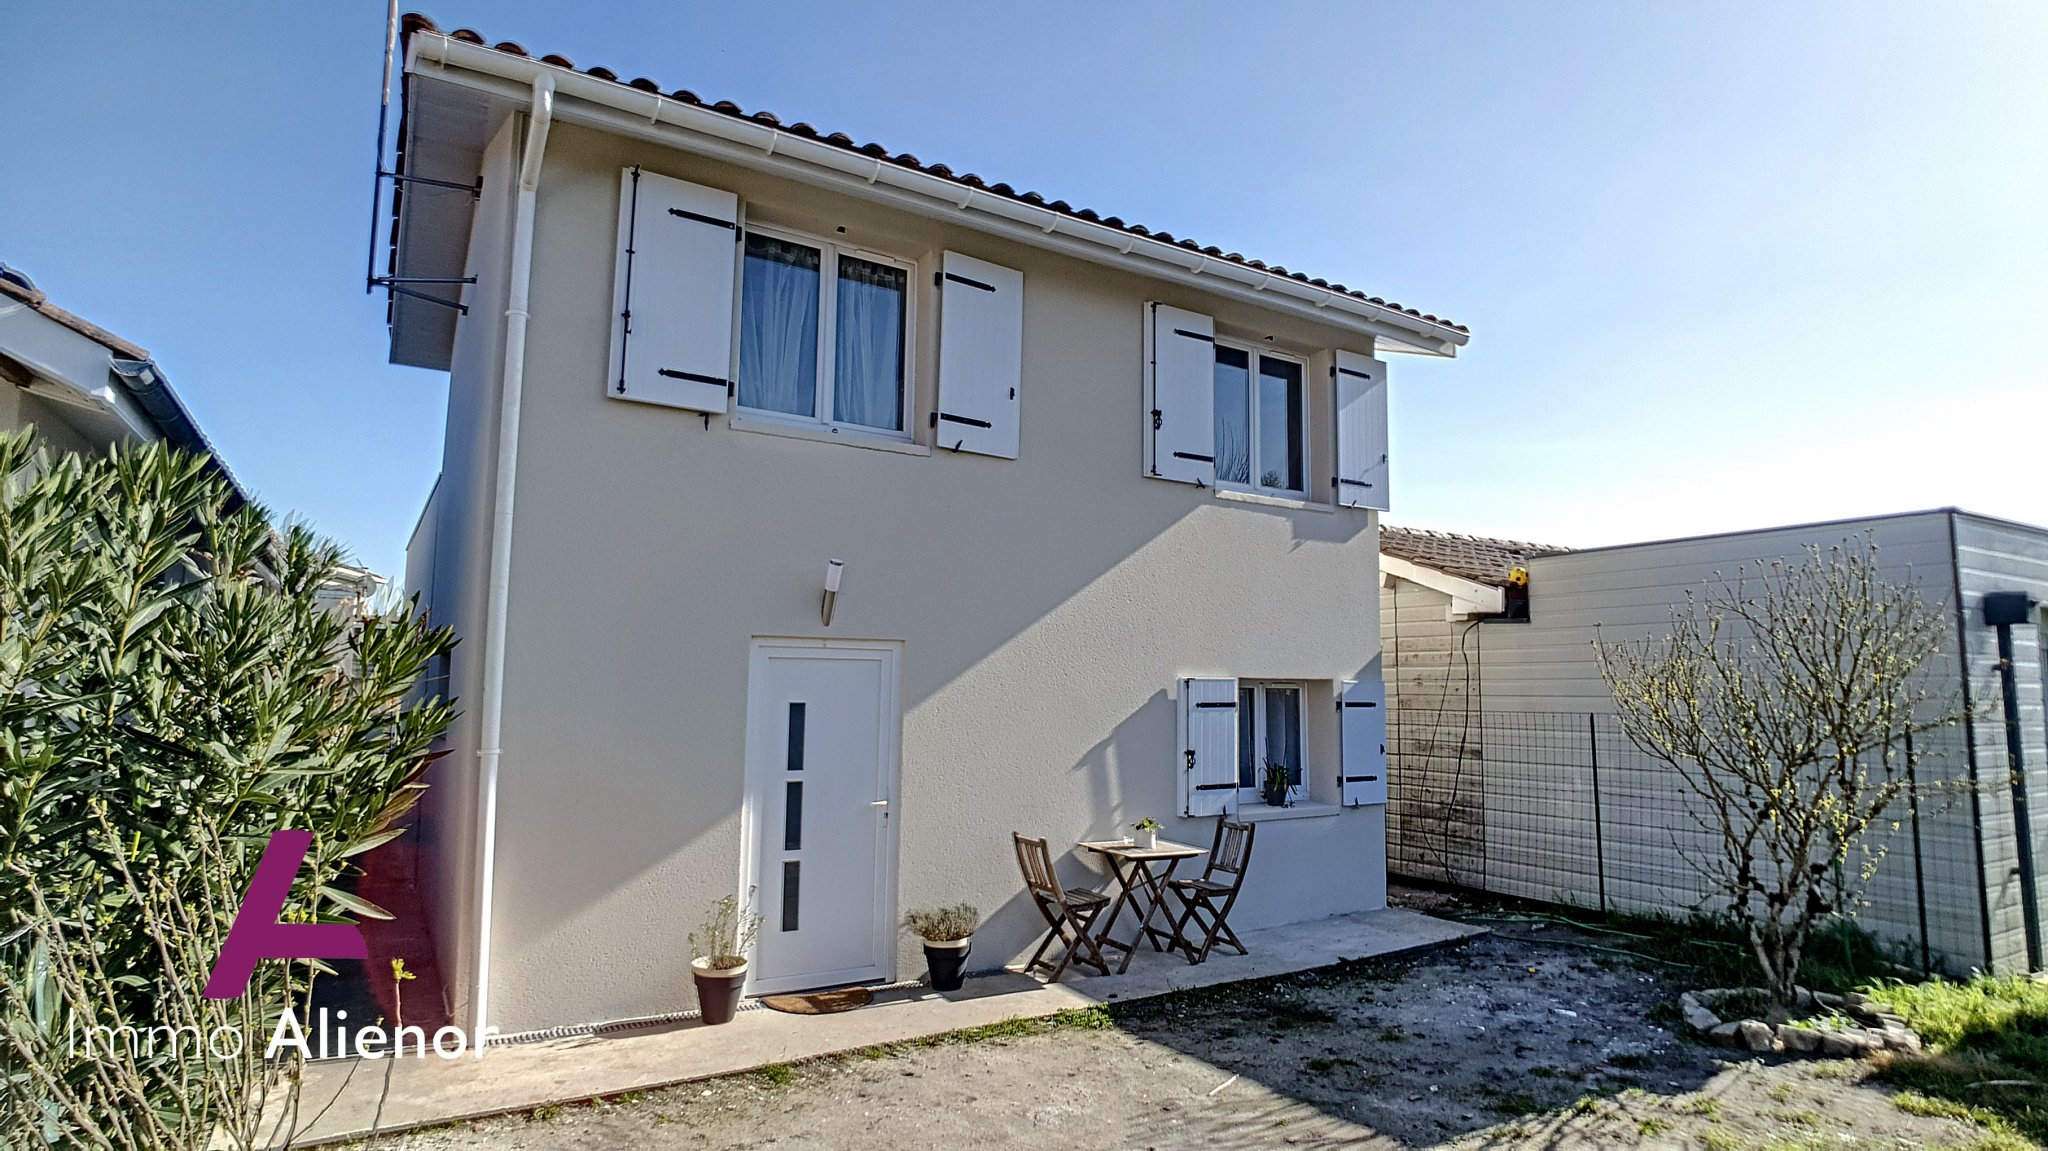 Maison rénovée de 85 m2